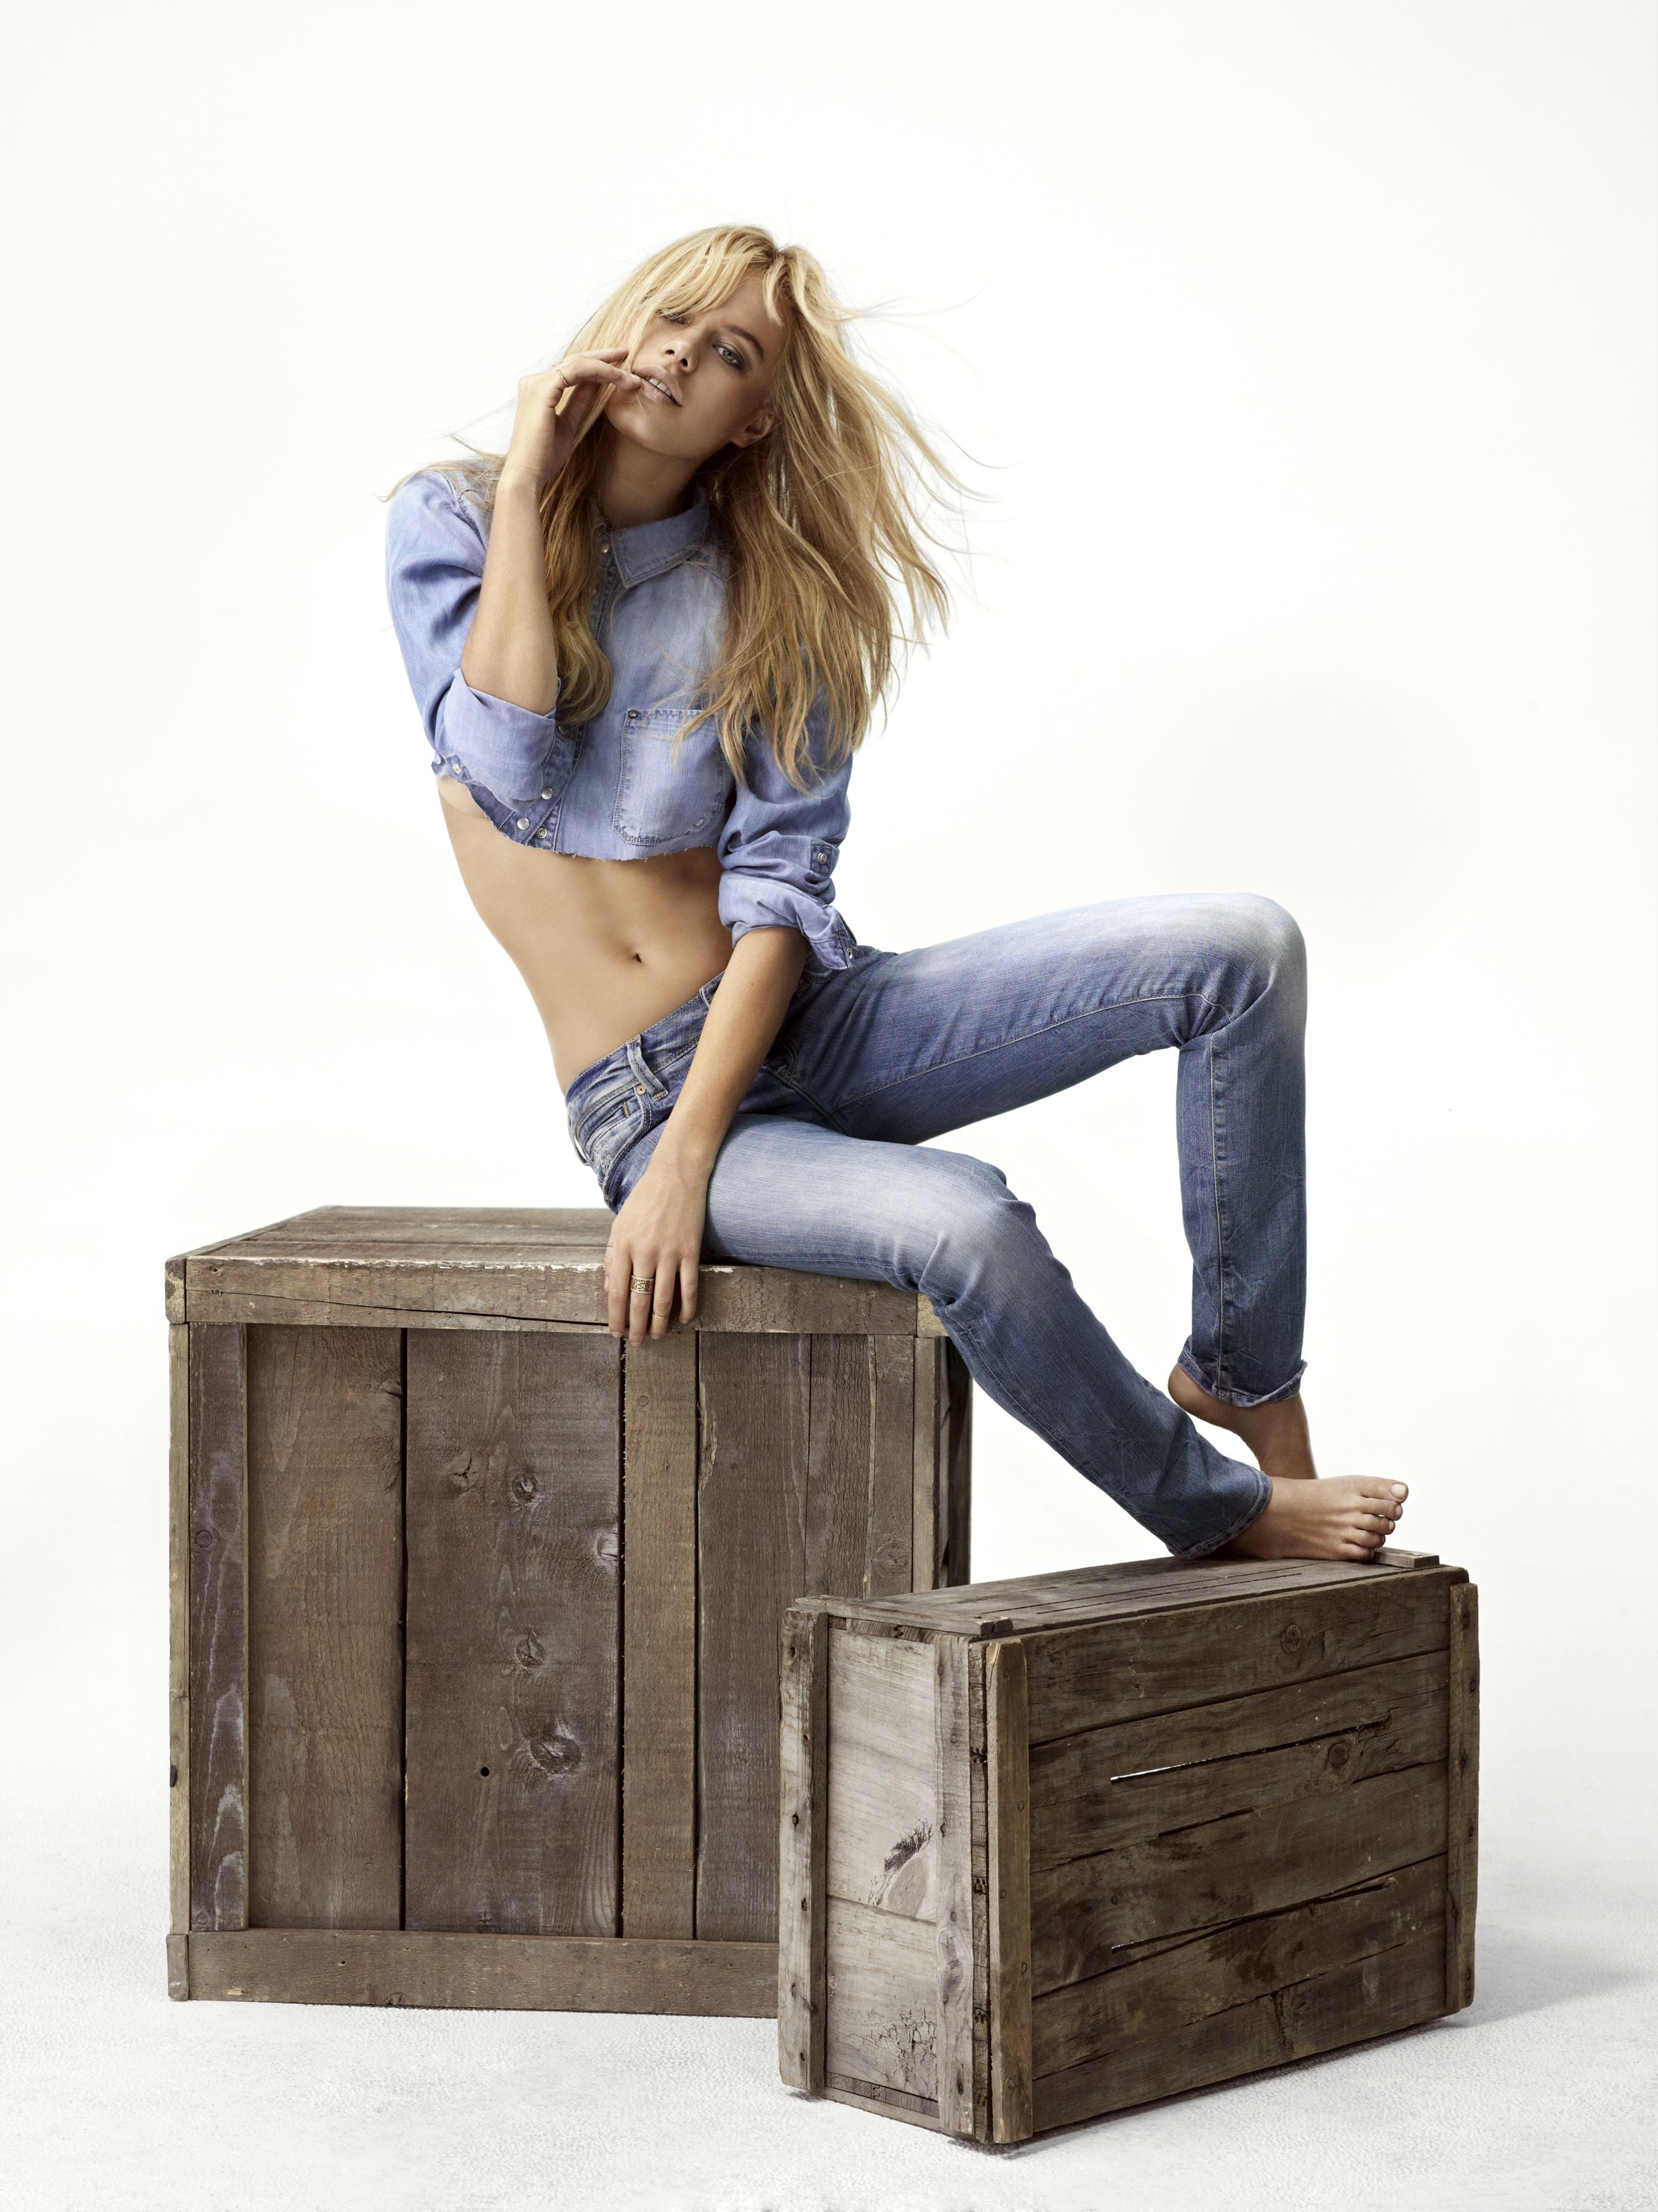 Feet Camille Rowe naked (35 photos), Sexy, Bikini, Selfie, cameltoe 2020